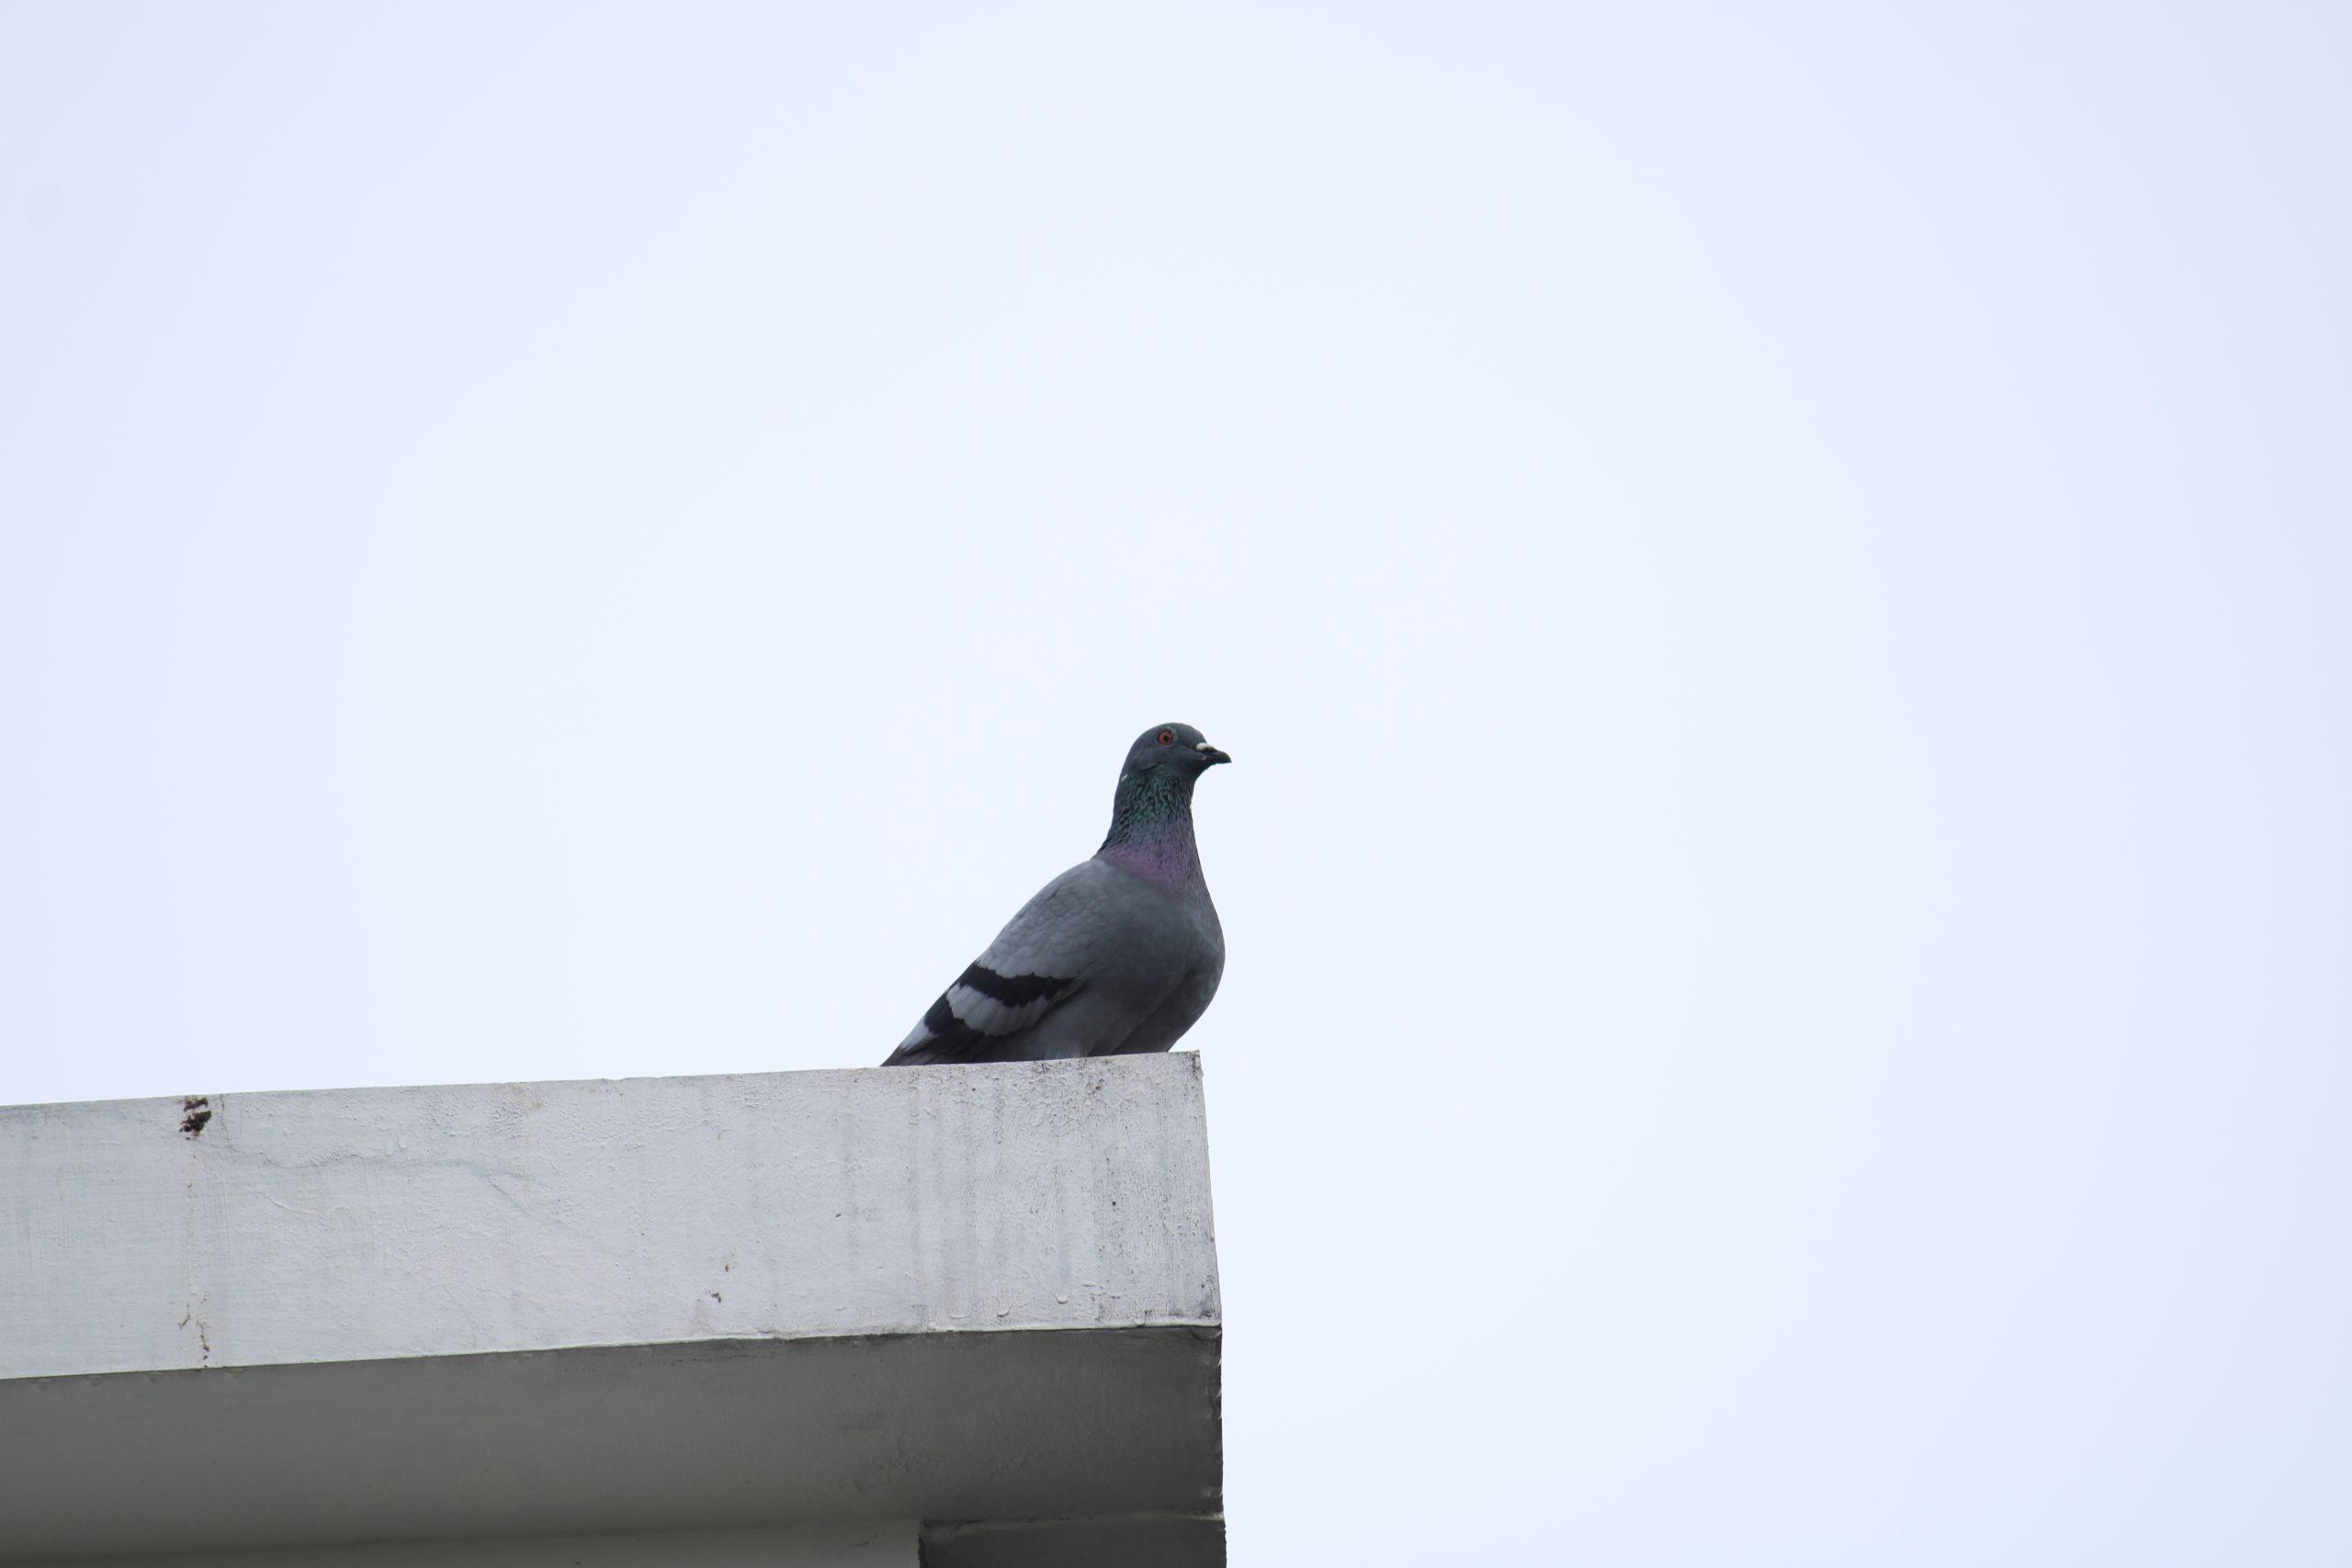 A dove sitting